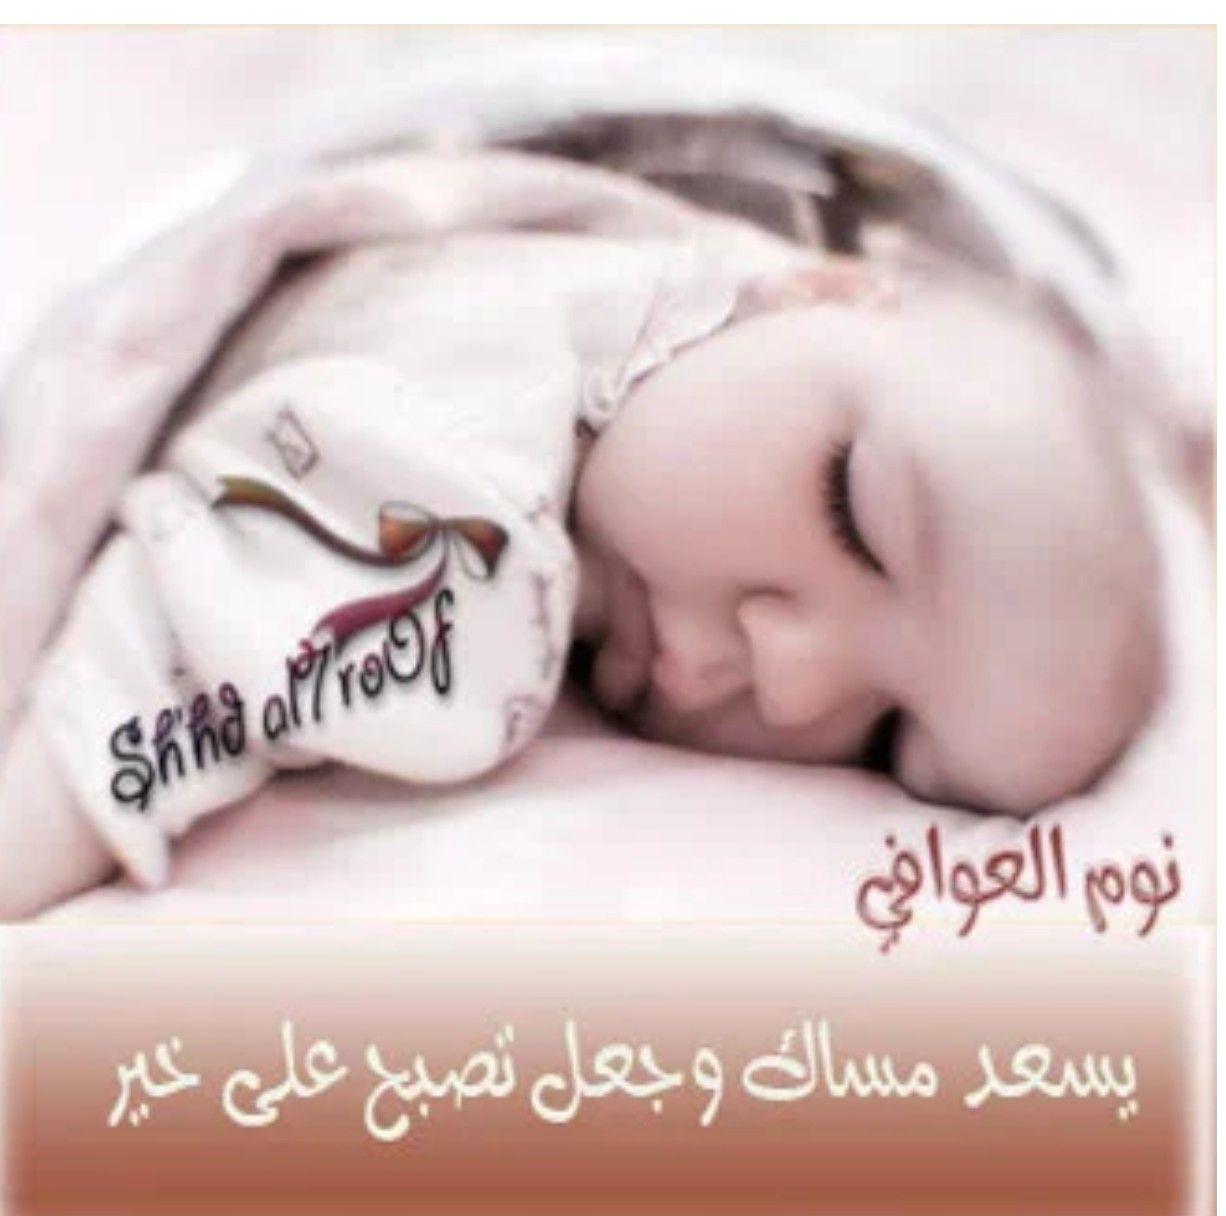 Pin By فلسطينية ولي الفخر On نوم العوافي واحلام سعيدة Baby Onesies Kids Onesies